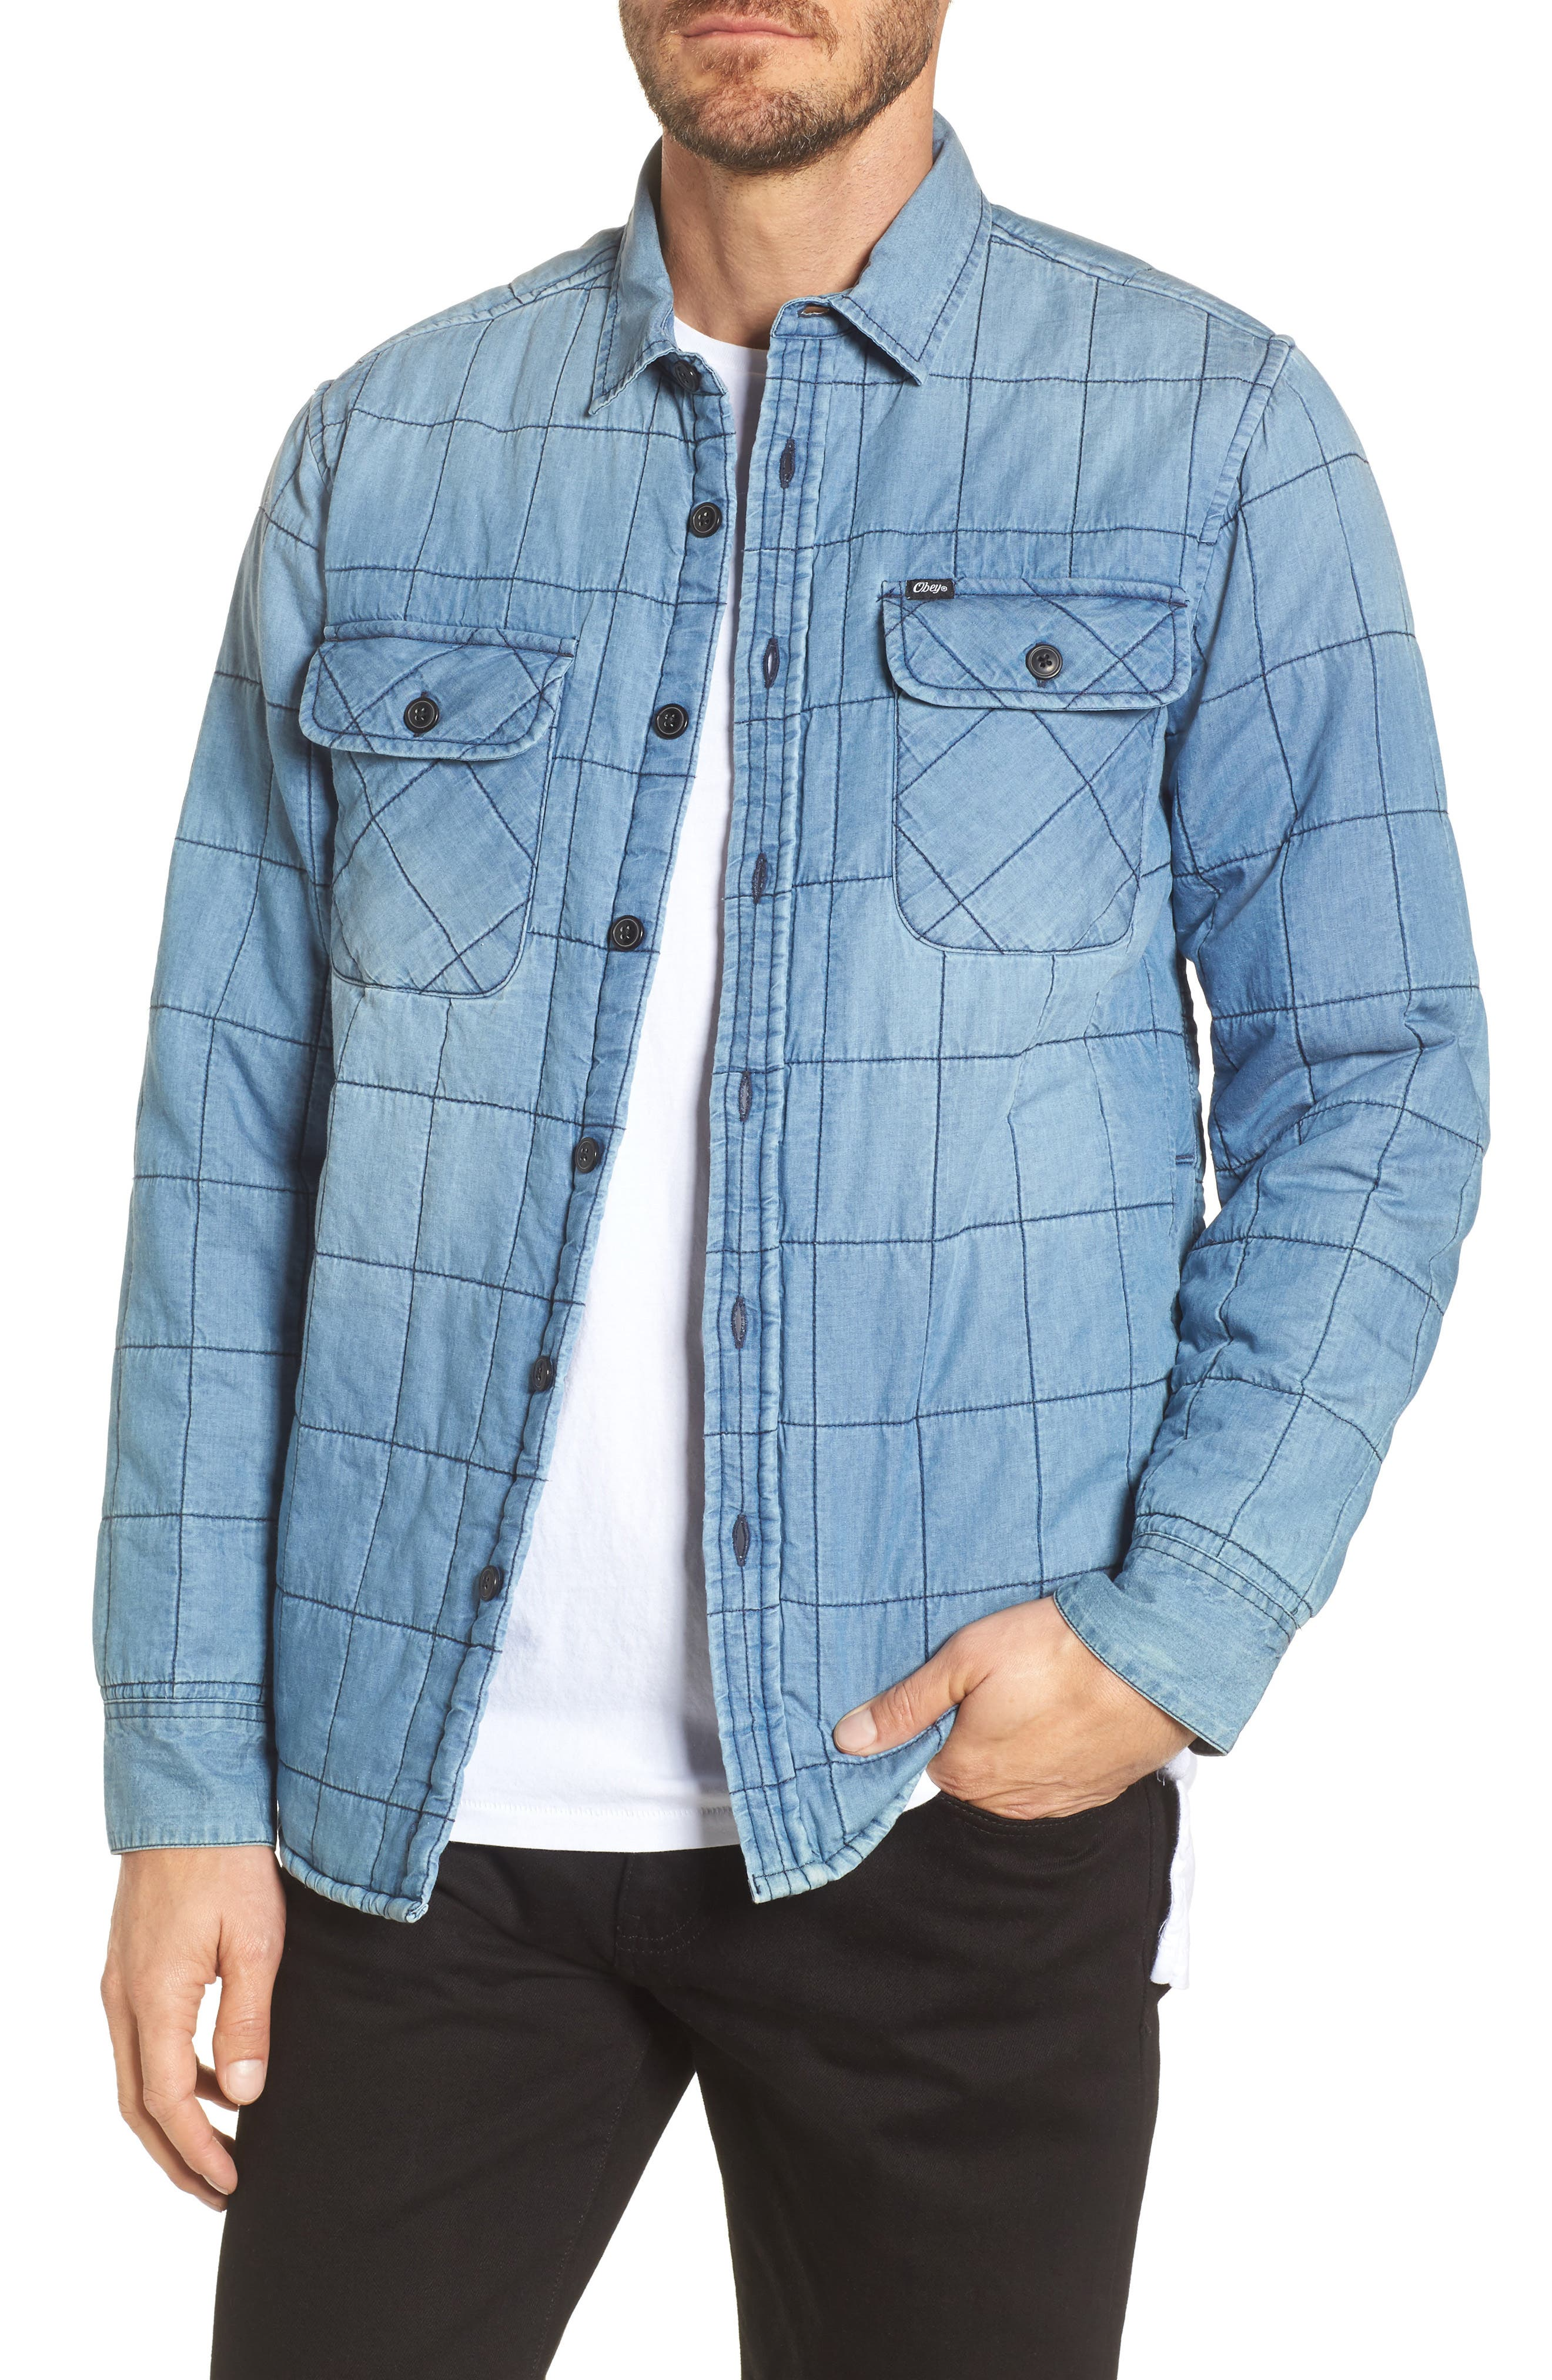 Wrecker Jacket,                         Main,                         color, 408